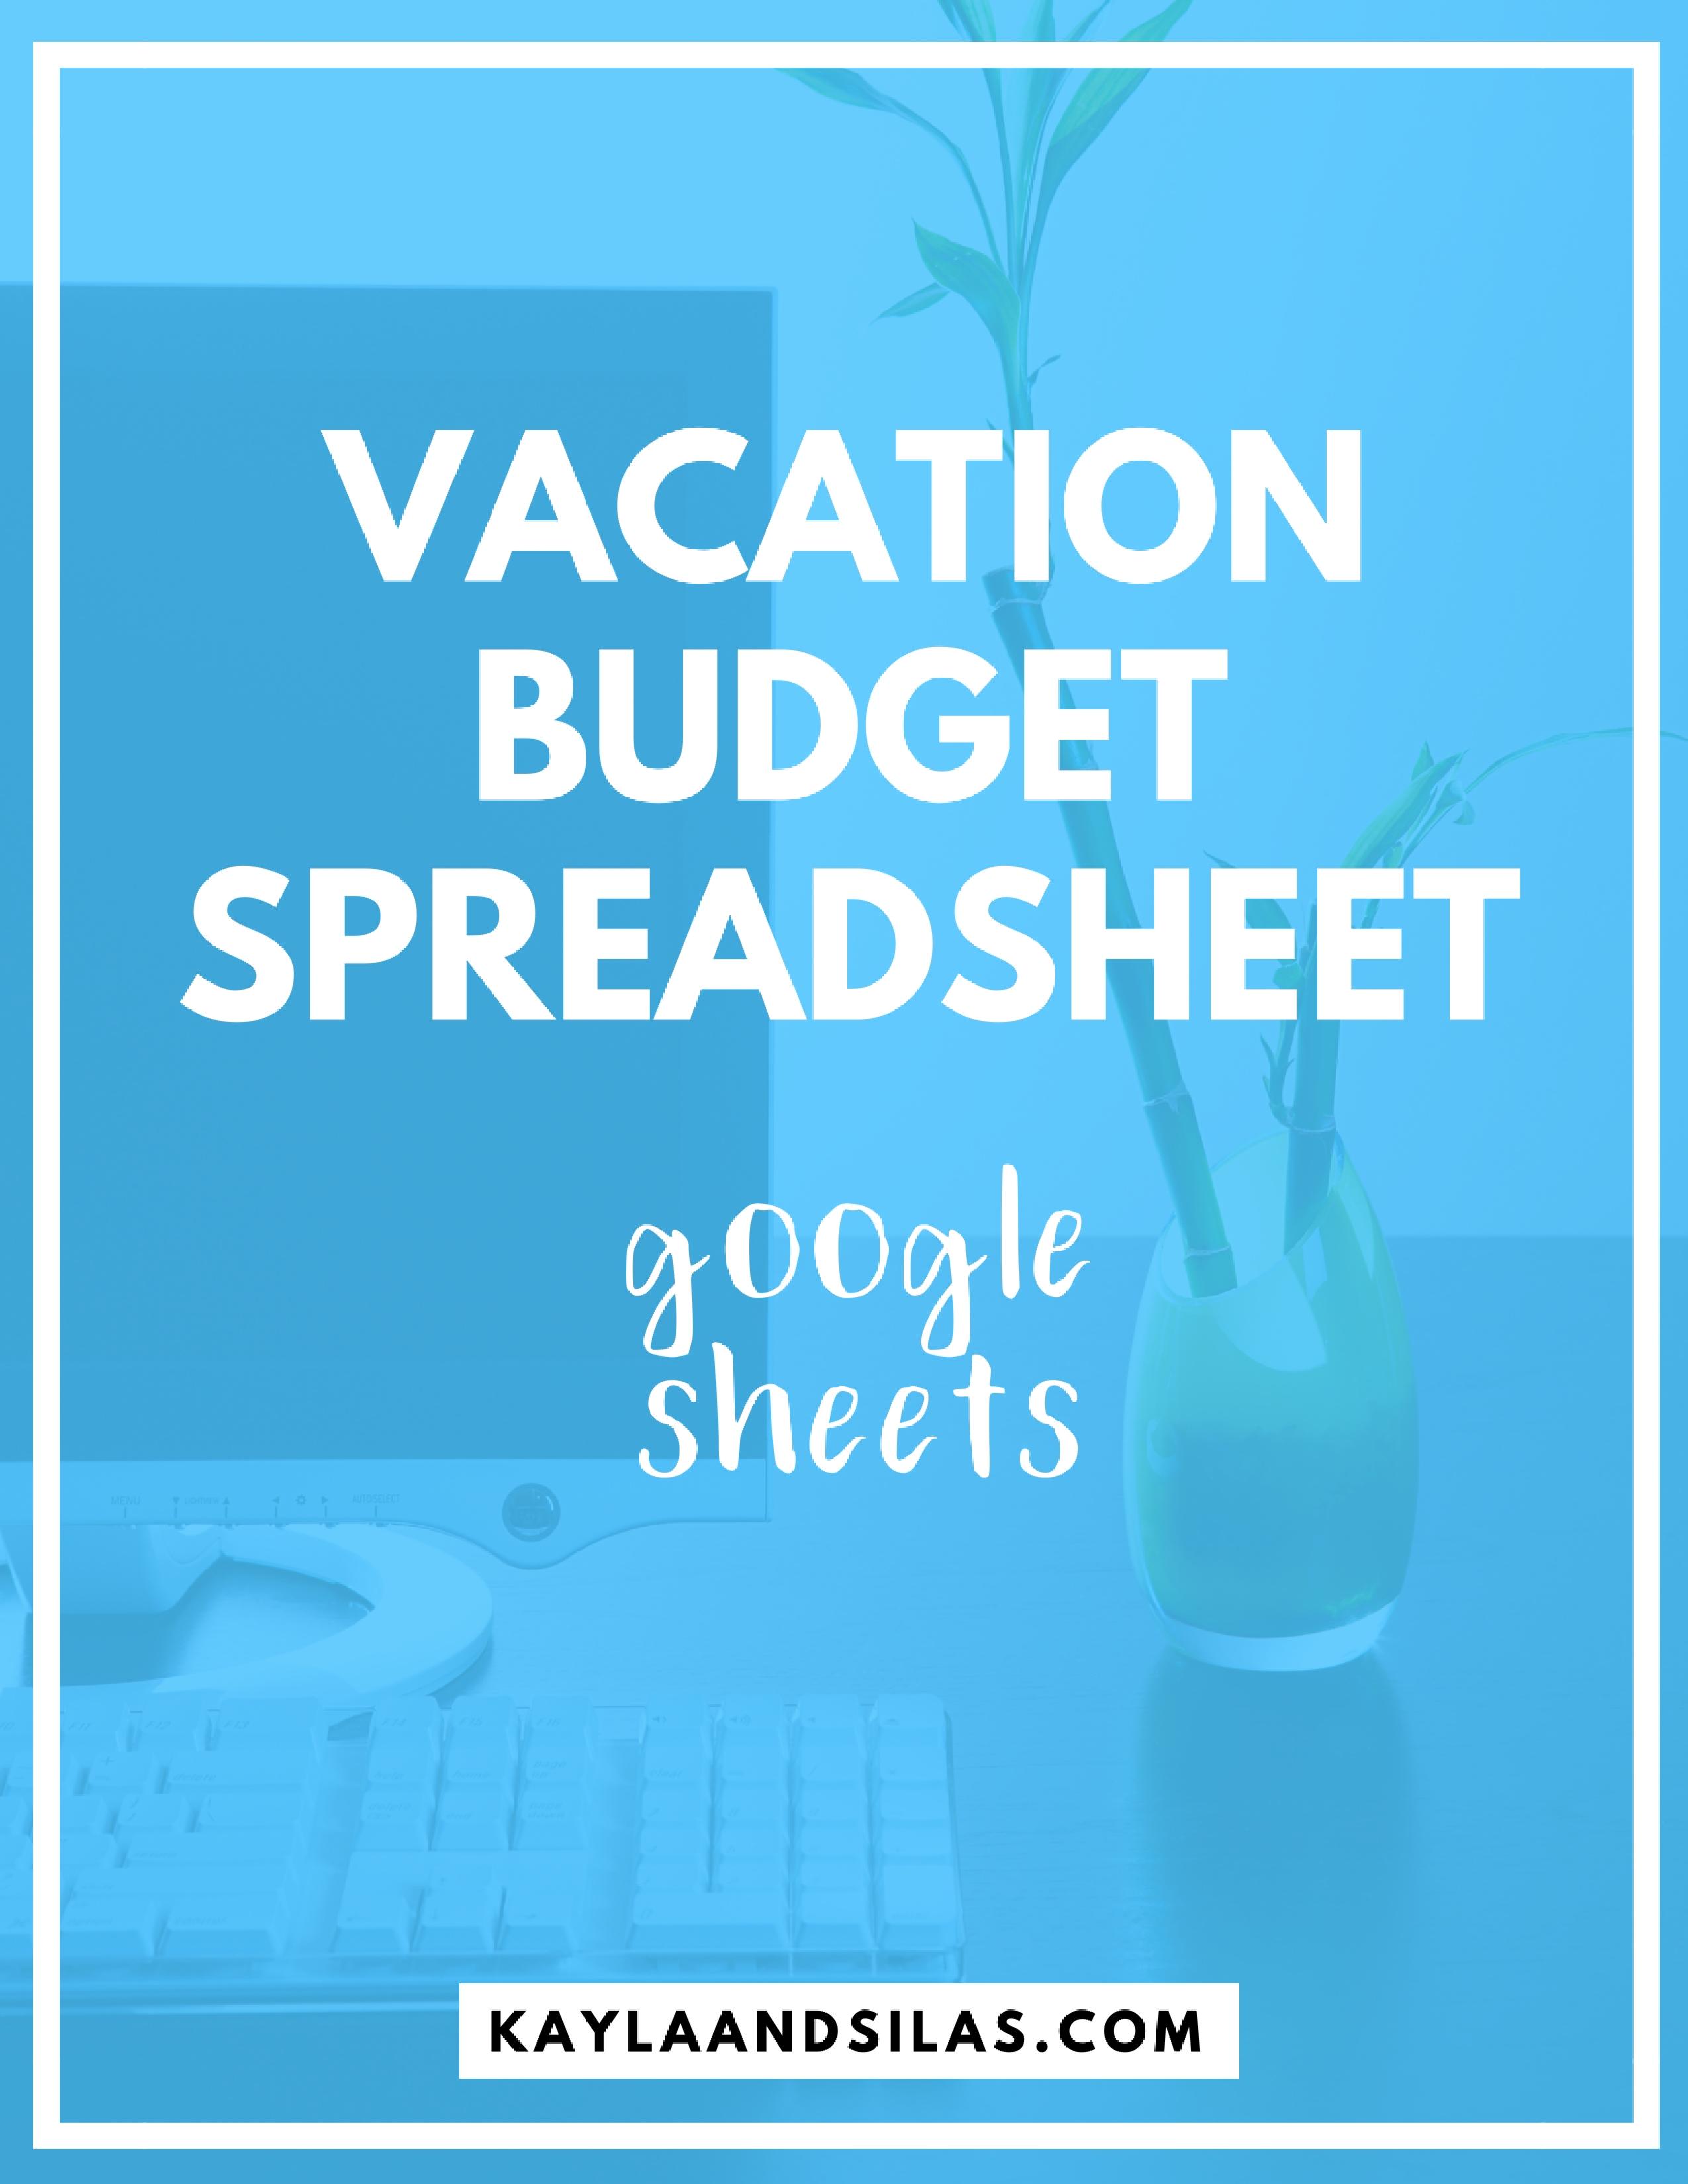 Vacation Budget Spreadsheet Sheets